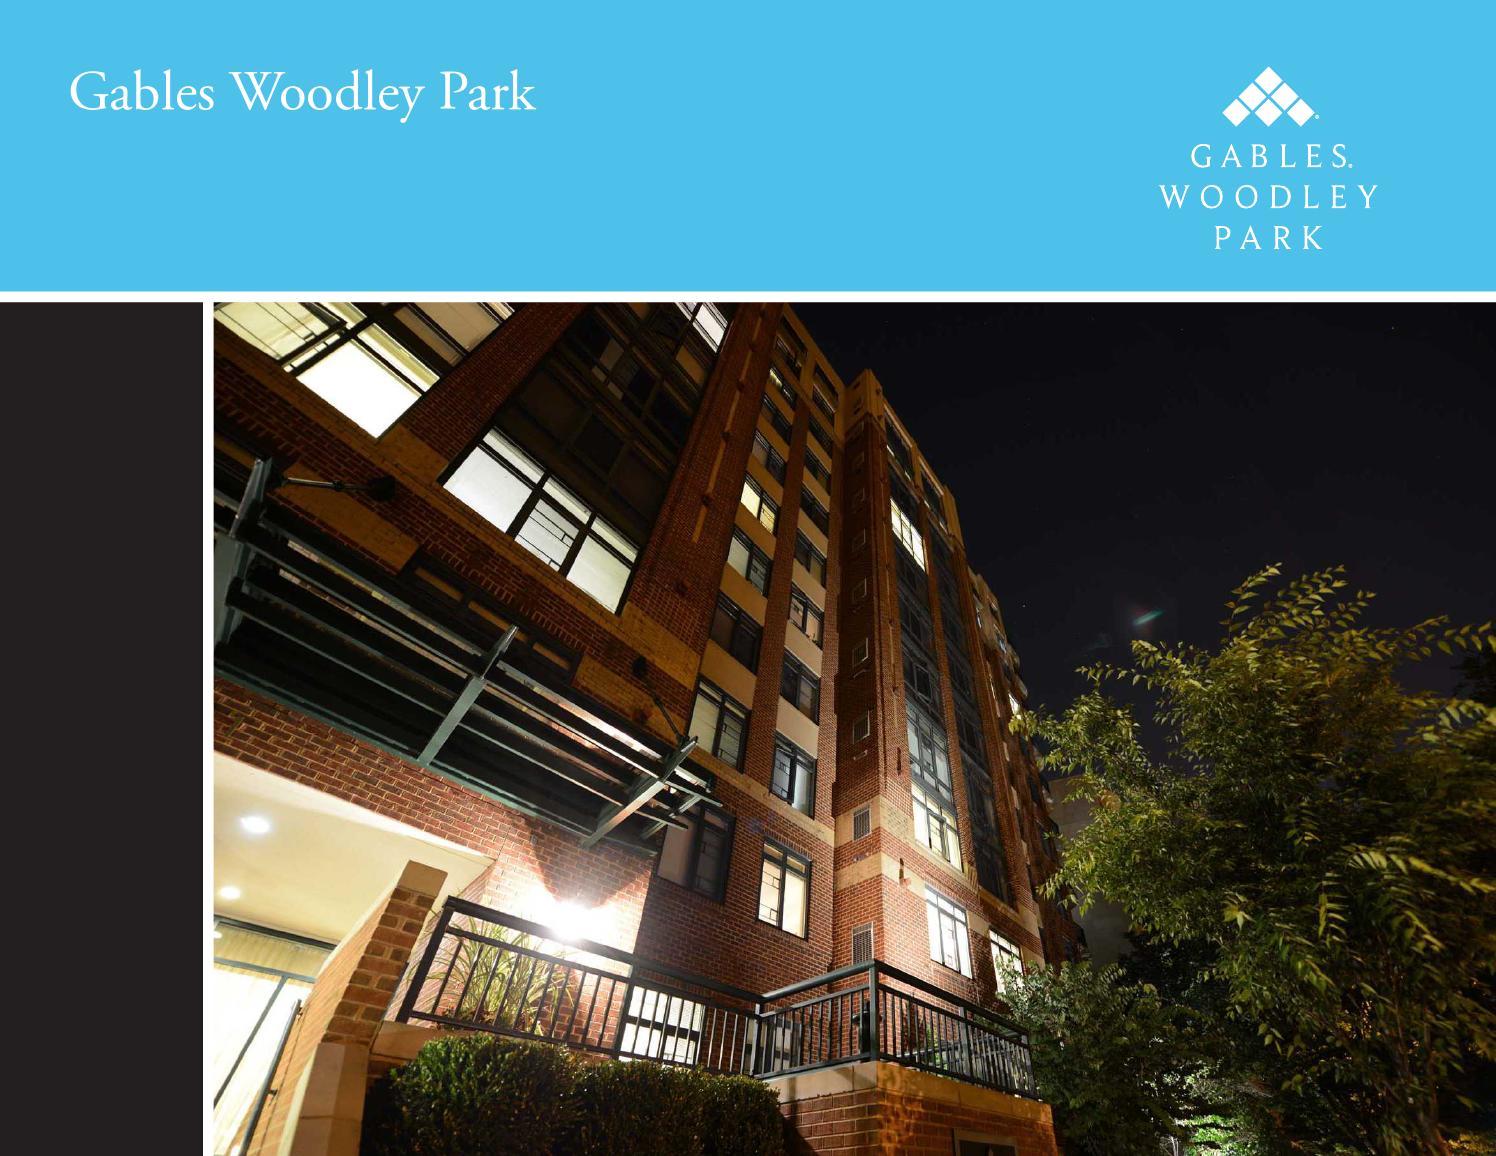 Gables woodley park e brochure by gables residential issuu for 67 park terrace east